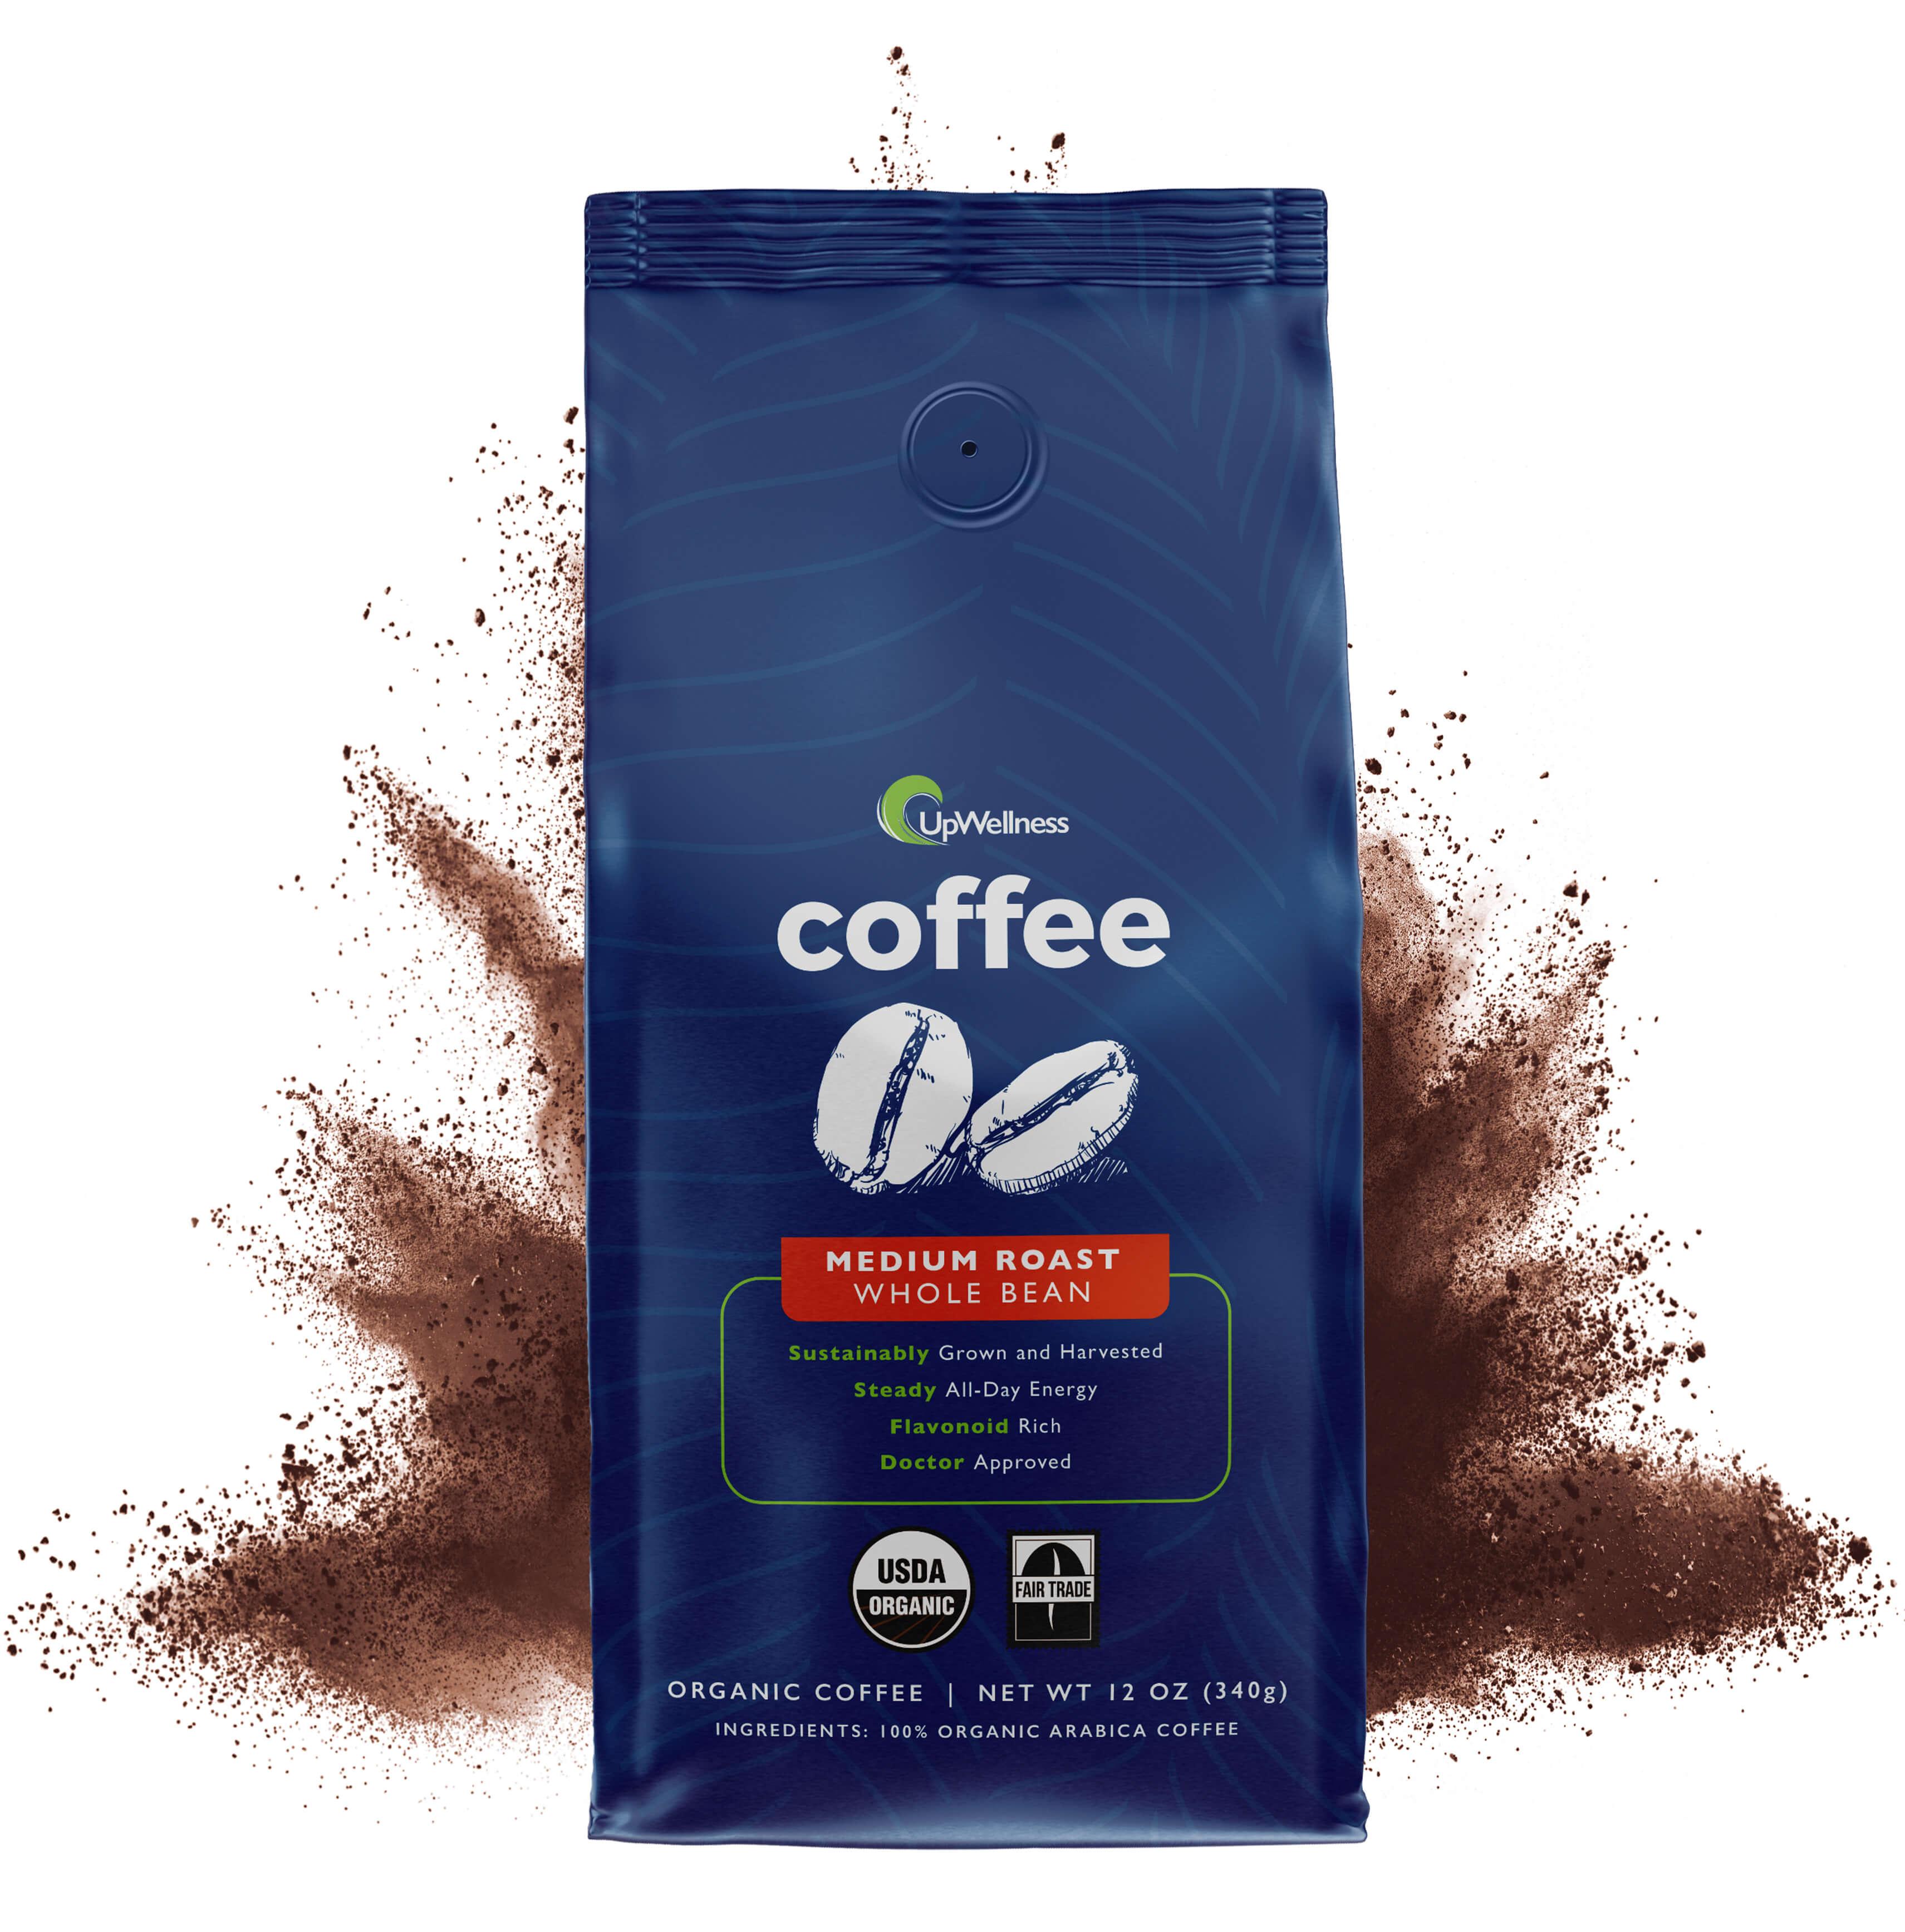 UpWellness Coffee